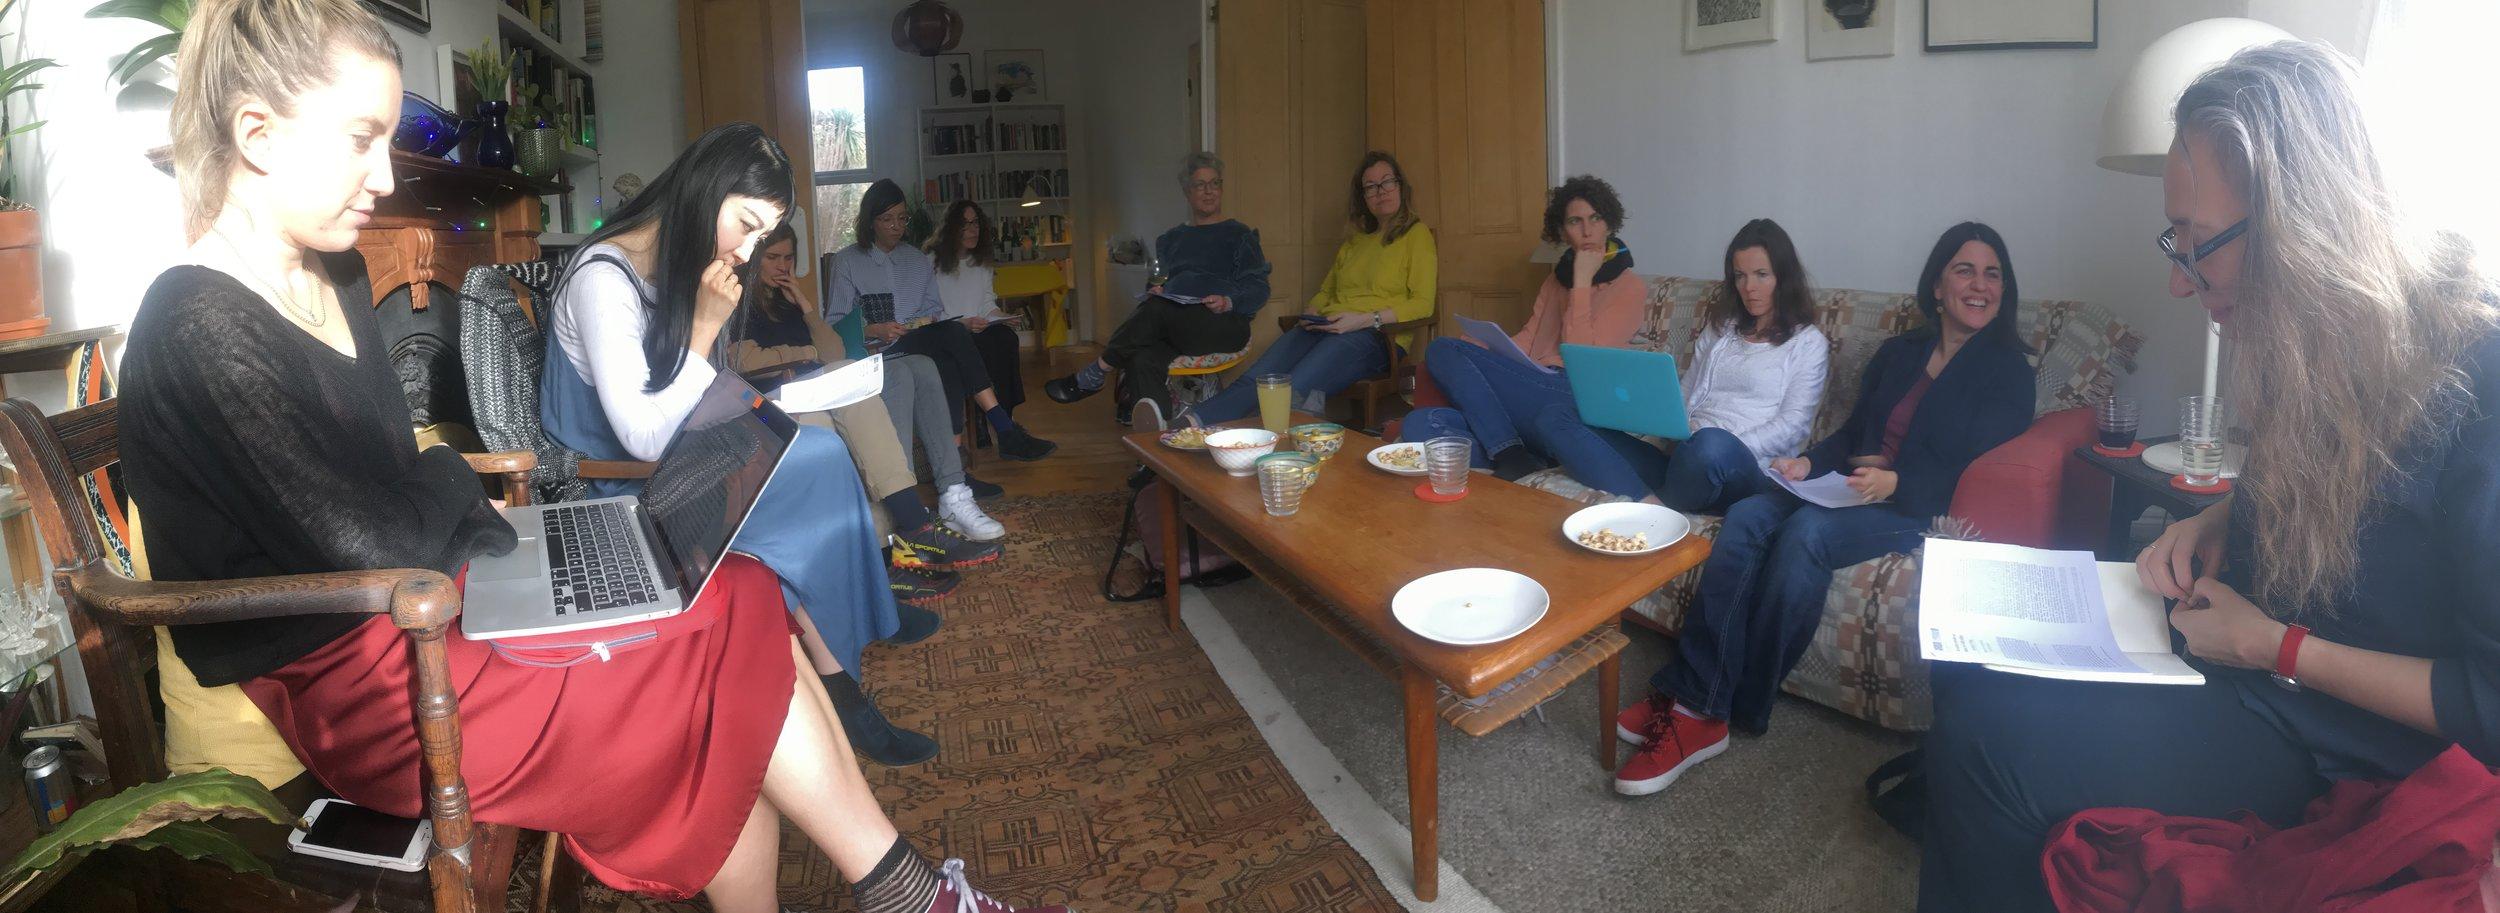 Kurdish Feminisms, Meeting 1: Nadje Al-Ali & Latif Tas, March 2019_Photo Helena Reckitt